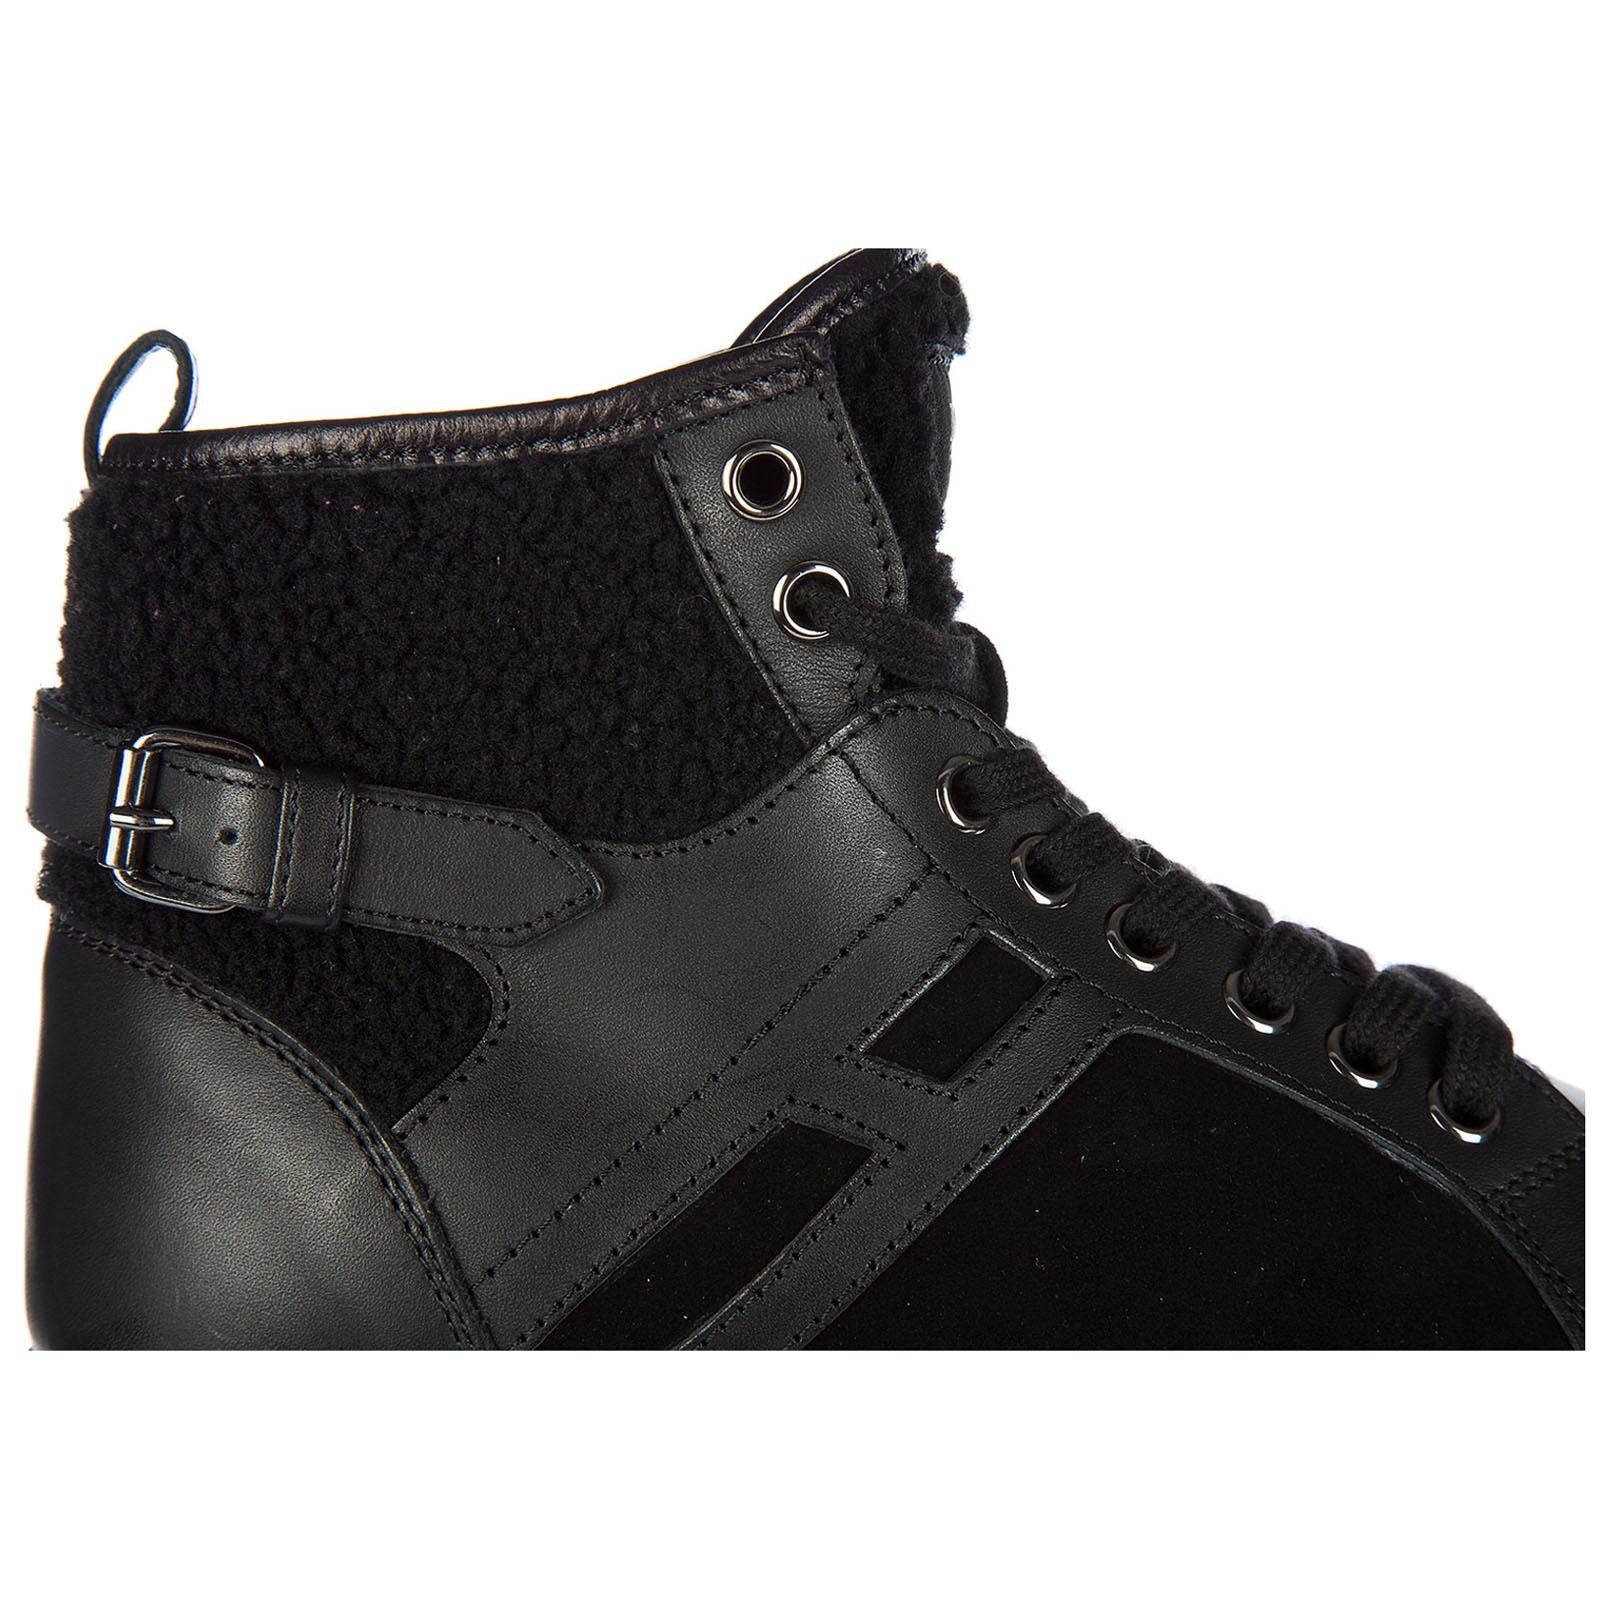 Blu Platino Hogan Rebel Scarpe Sneakers Alte In Pelle R182